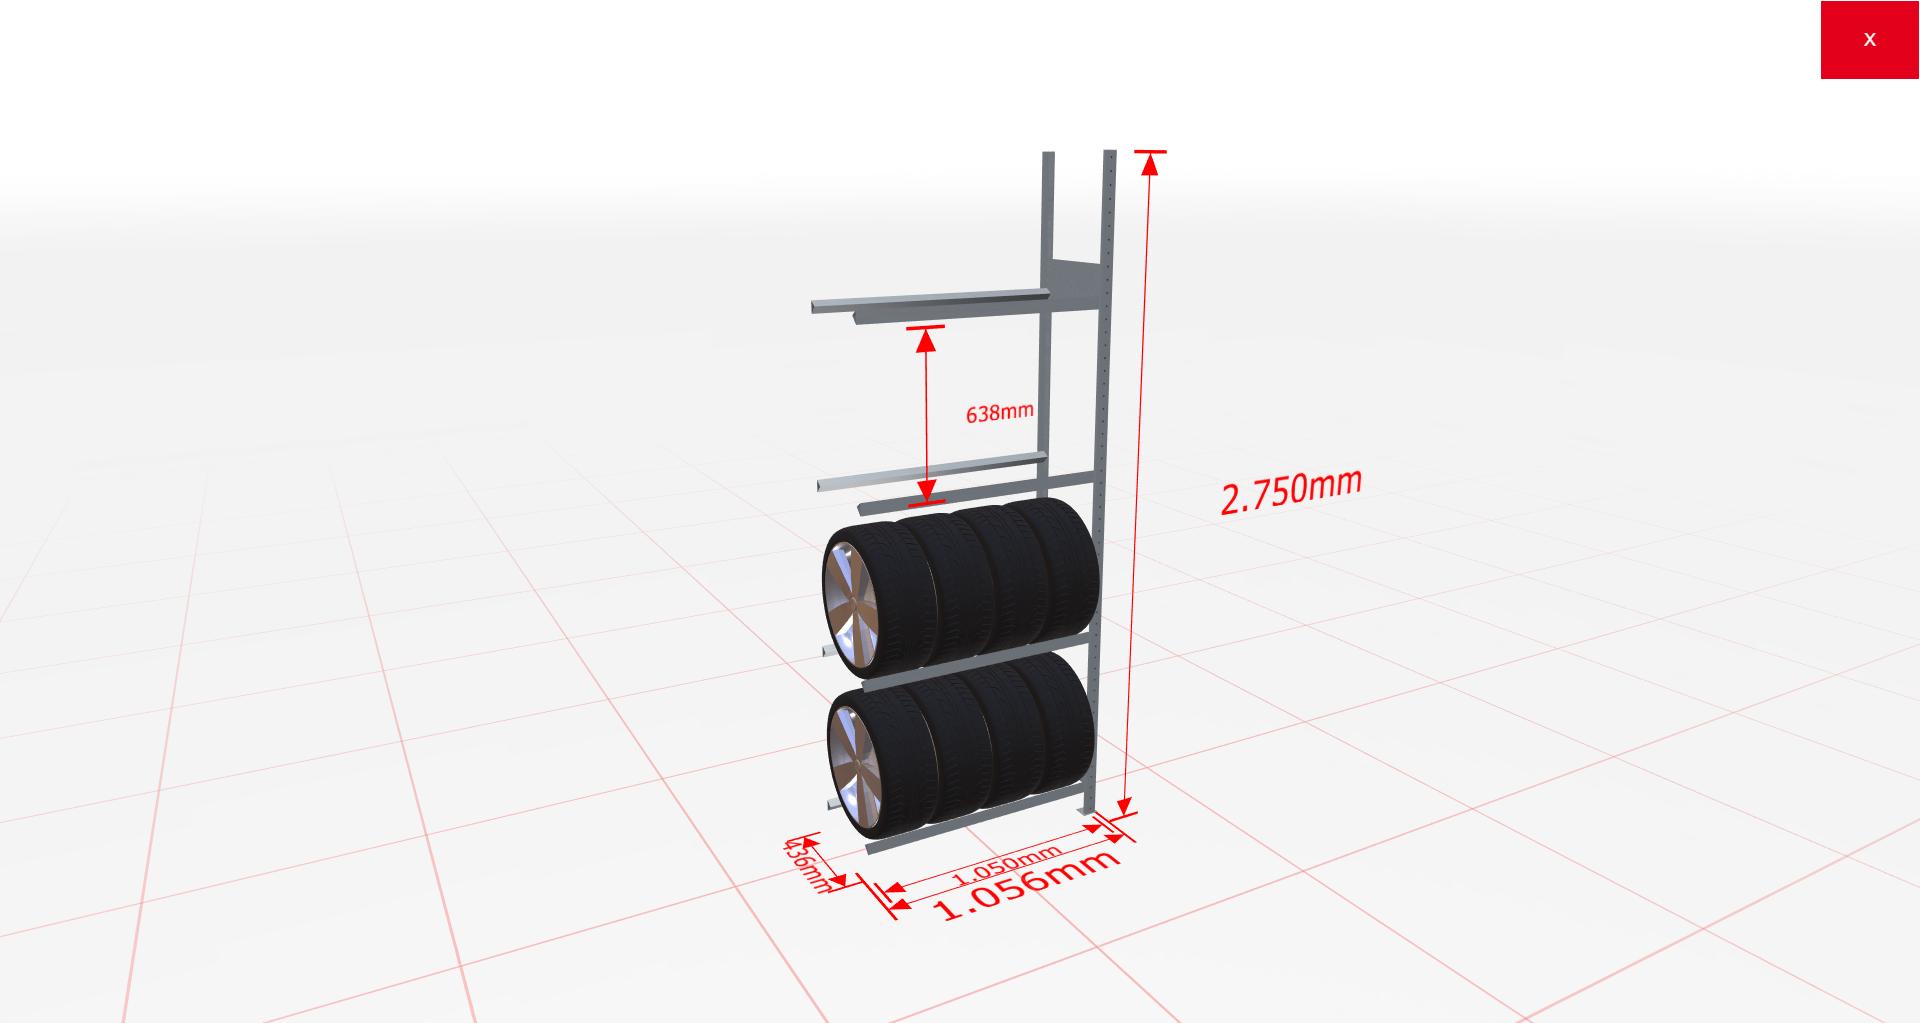 Räderregal Anbauregal SCHULTE Lagertechnik 2750x1050x400 mm – 4 Ebenen á 1050 mm, verzinkt